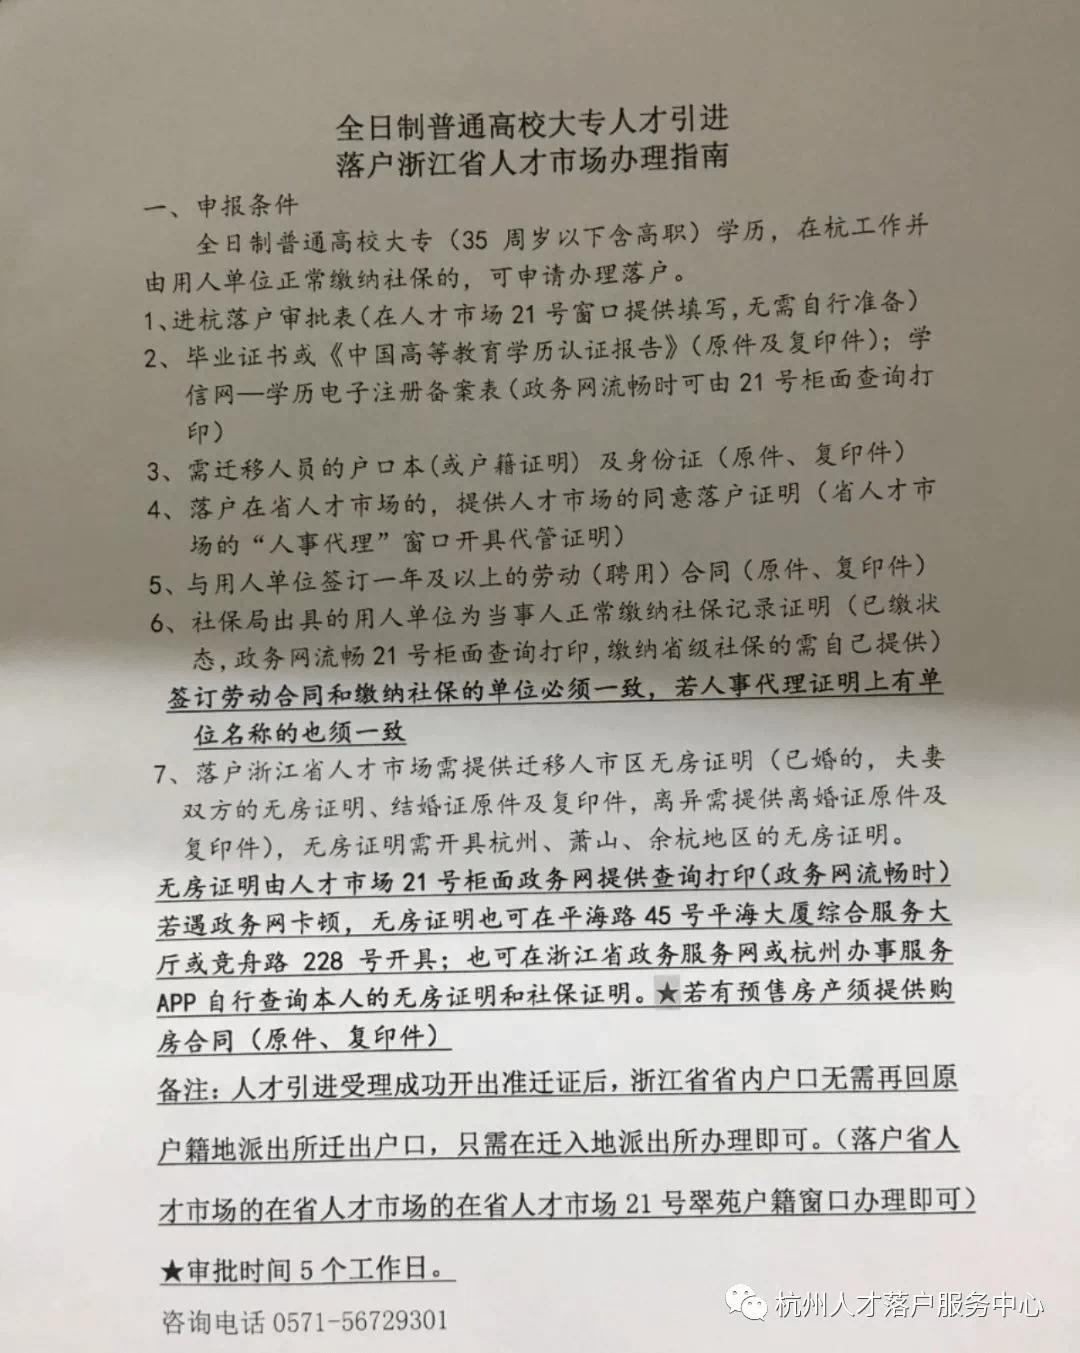 http://www.tsgfkj.cn/rencai/179097.html